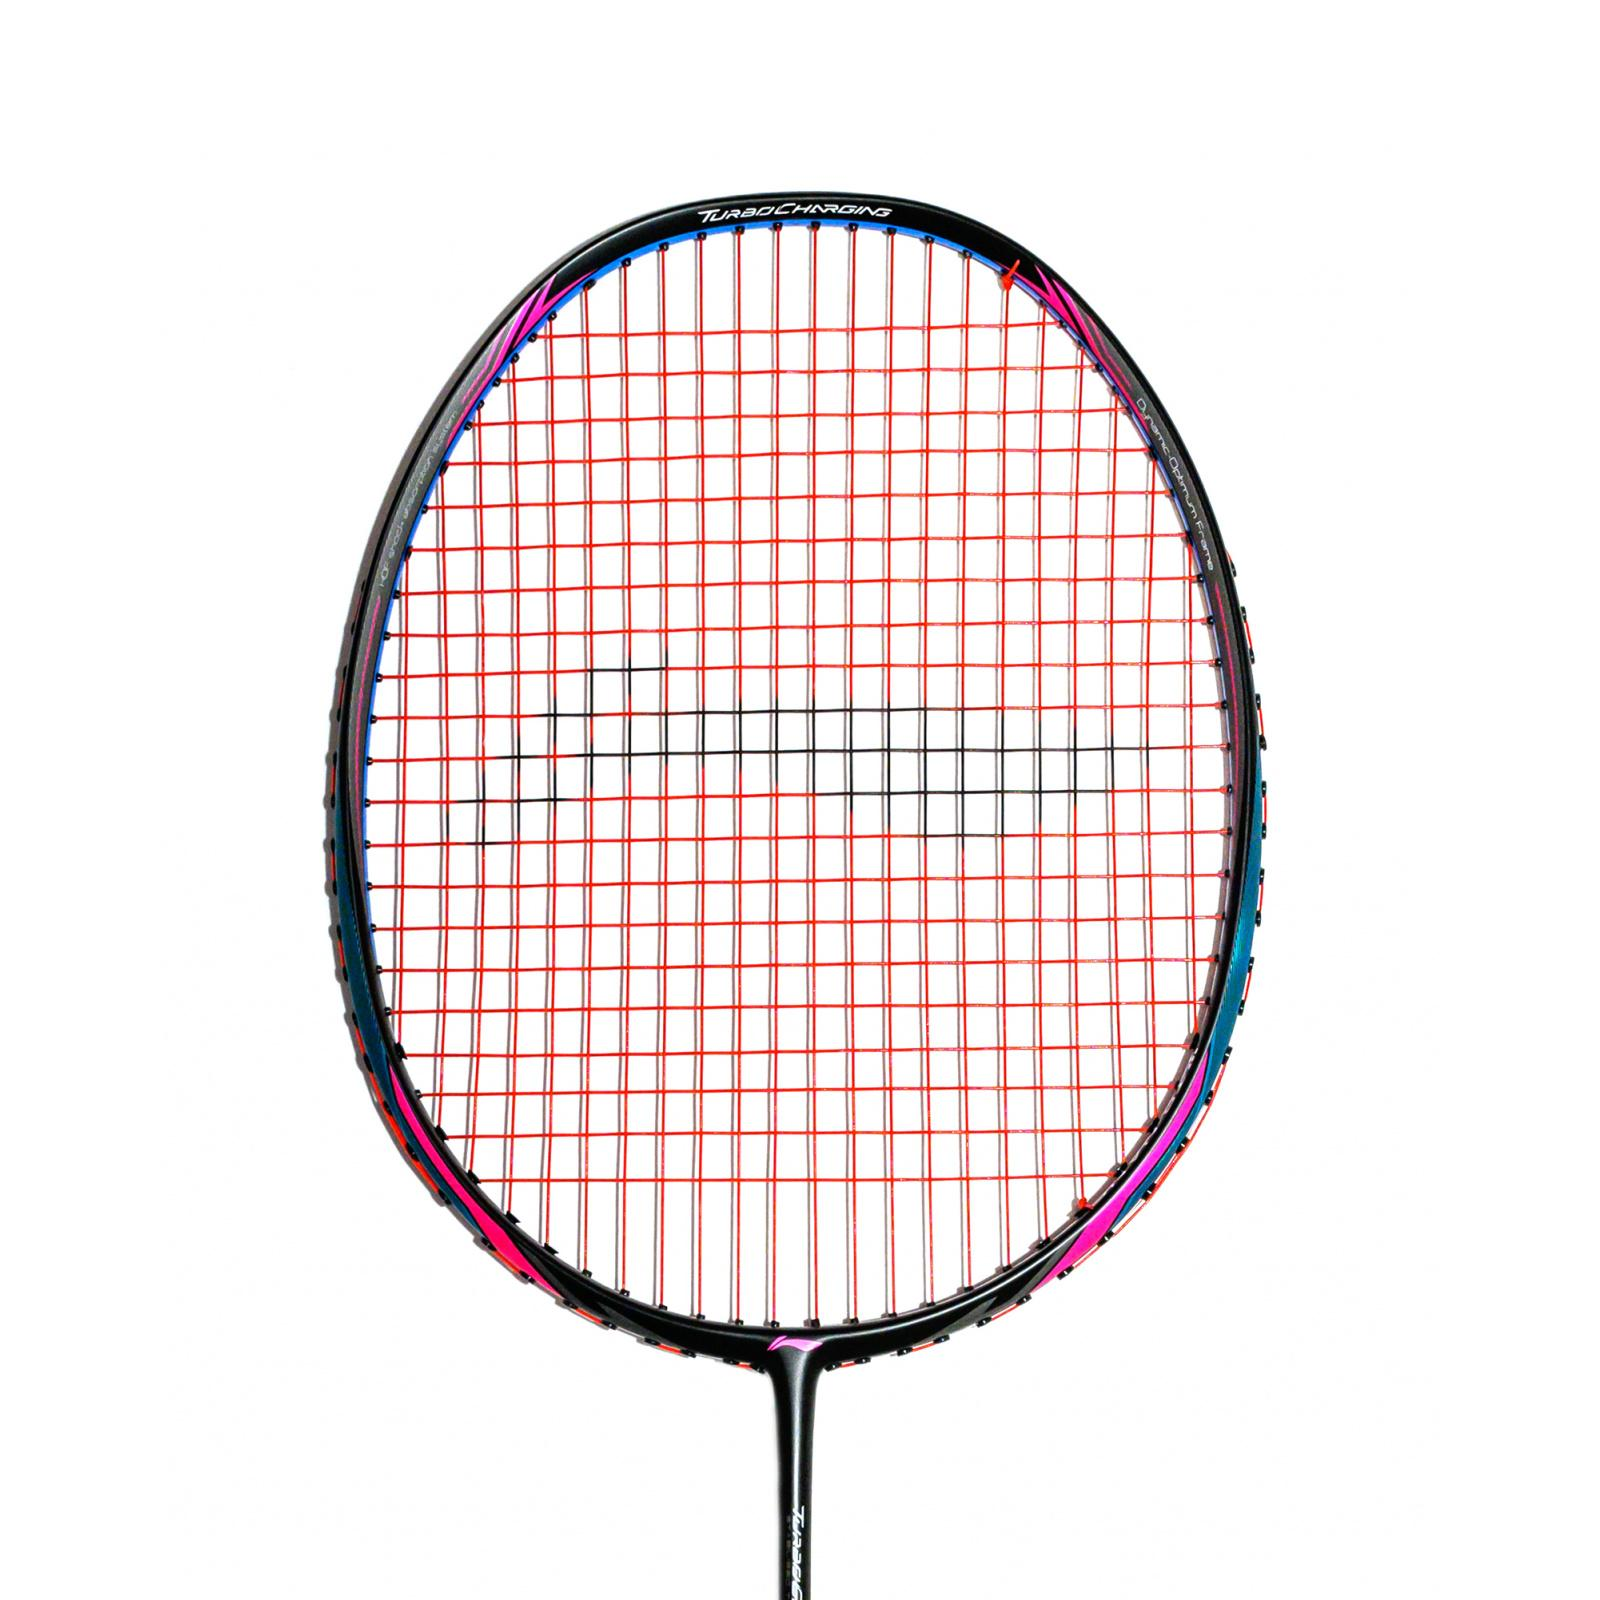 https://www.badec.store/produkty_img/badmintonova-raketa1570653895L.jpg